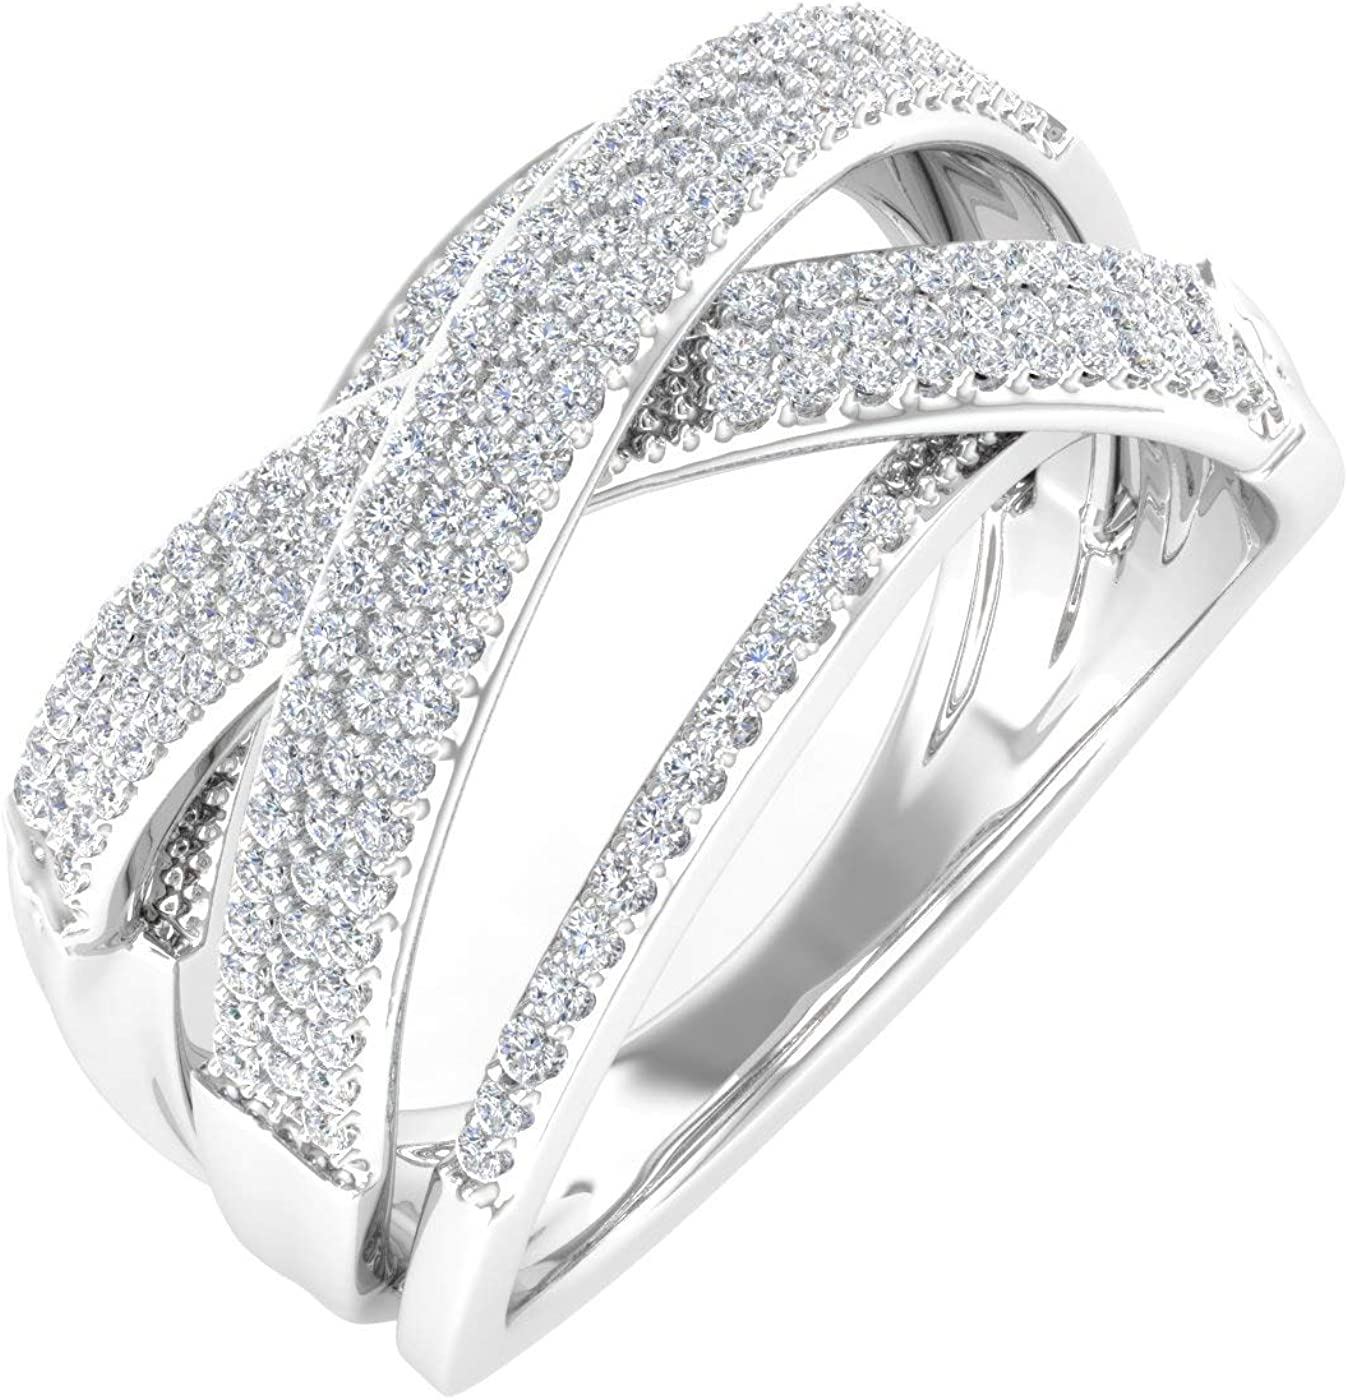 0.52 Carat Diamond Max 74% OFF Bypass Nashville-Davidson Mall Wedding Gold Band in 10K Ring